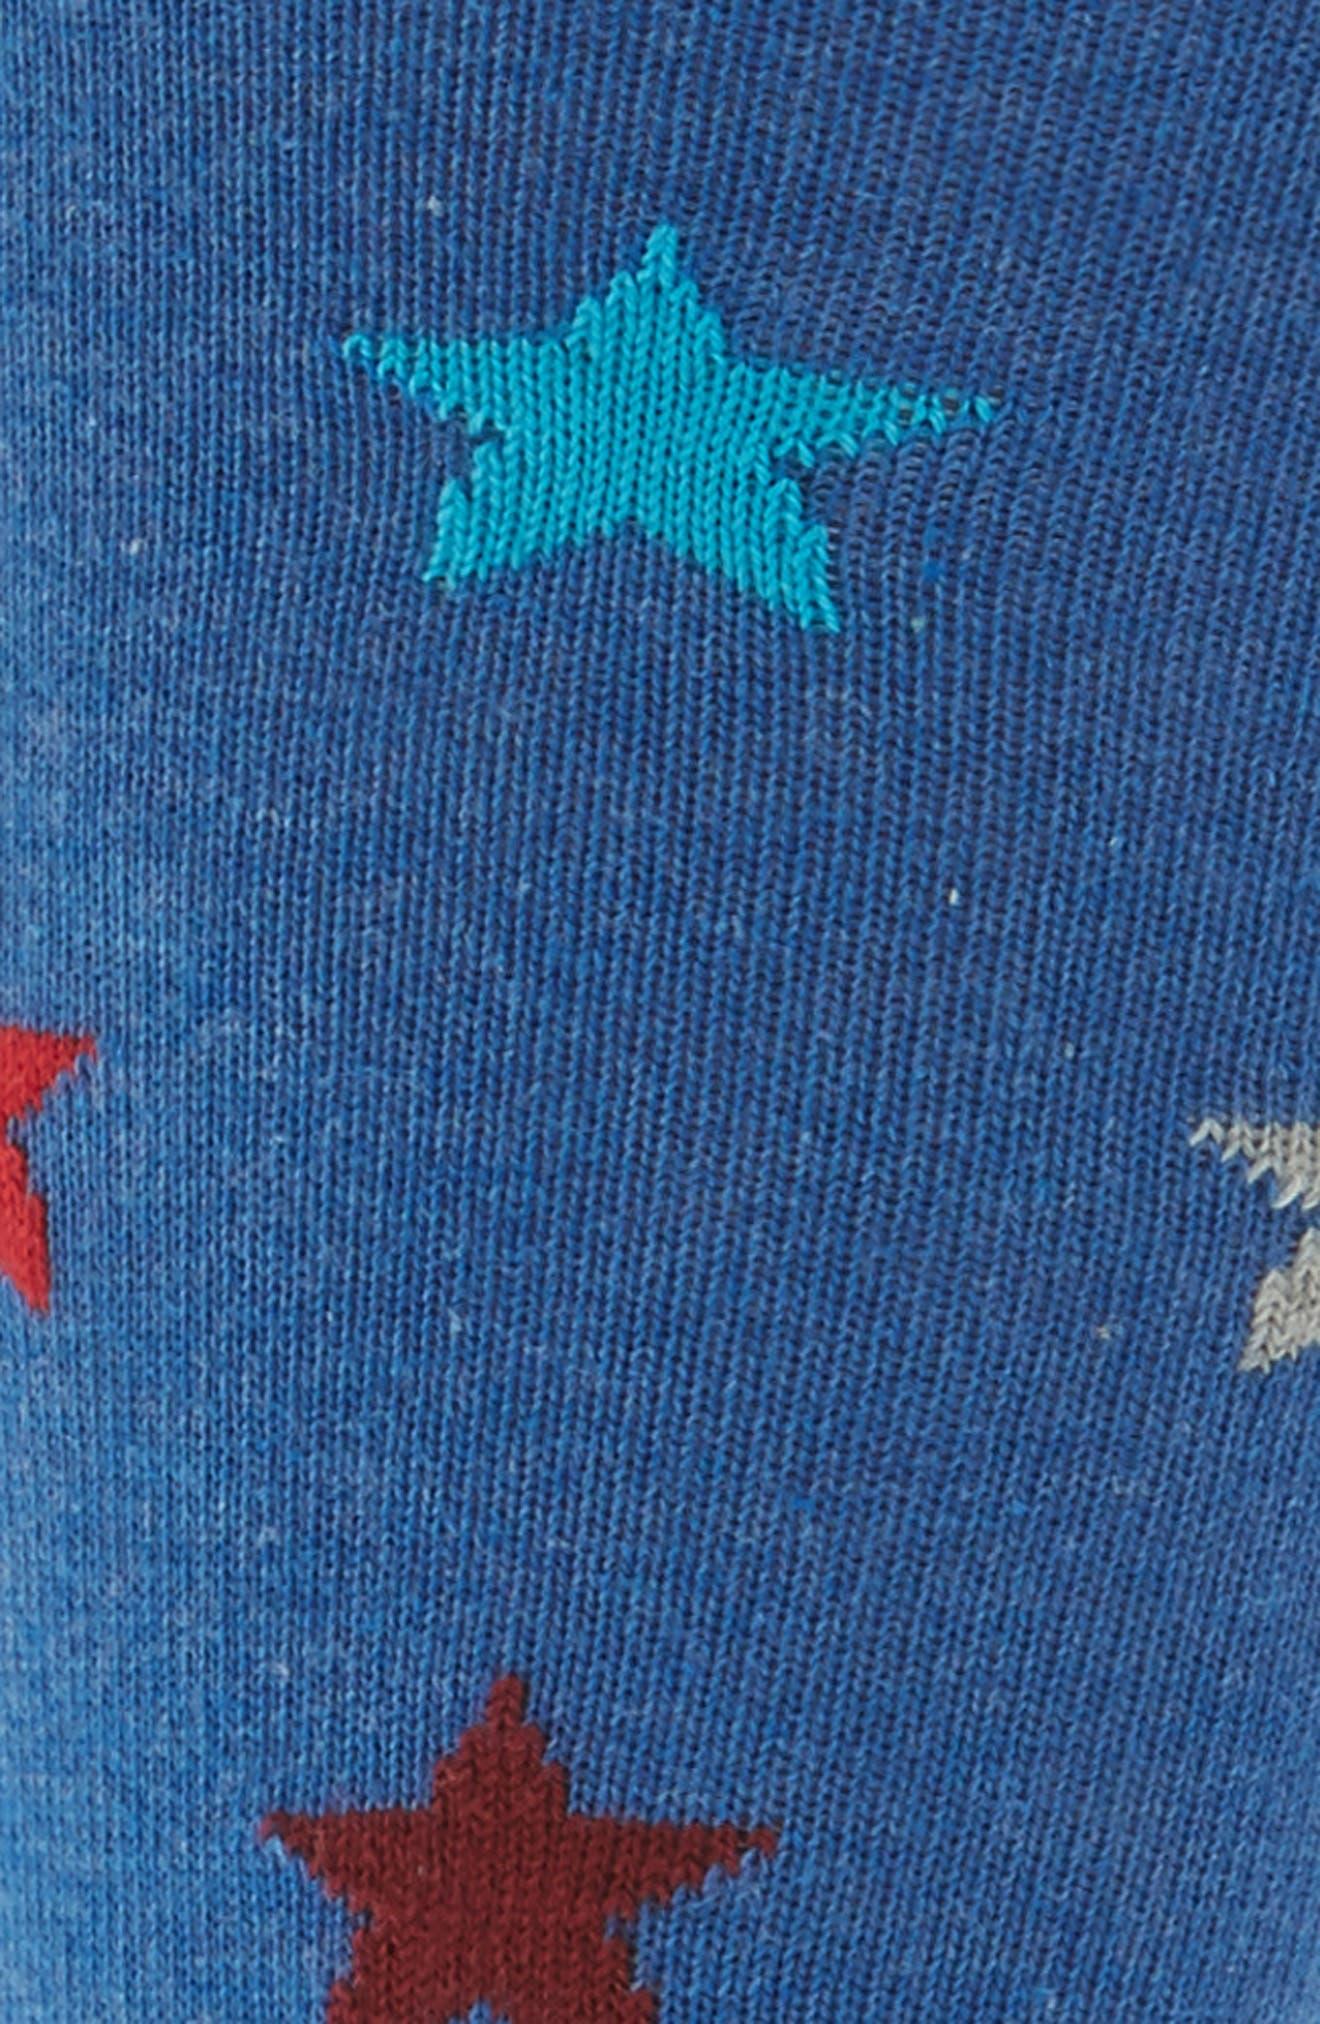 Stars & Stripes Socks,                             Alternate thumbnail 2, color,                             Blue Multi